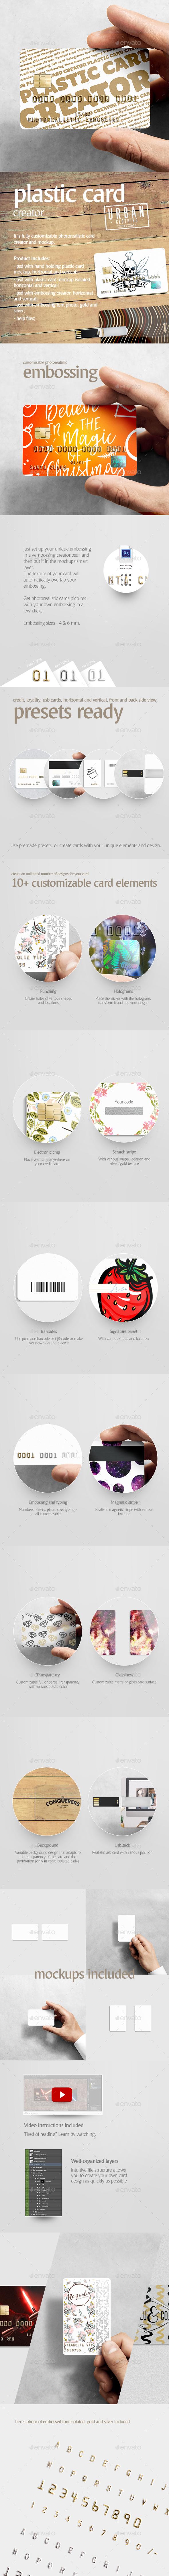 Plastic Card Creator by rebrandy | GraphicRiver